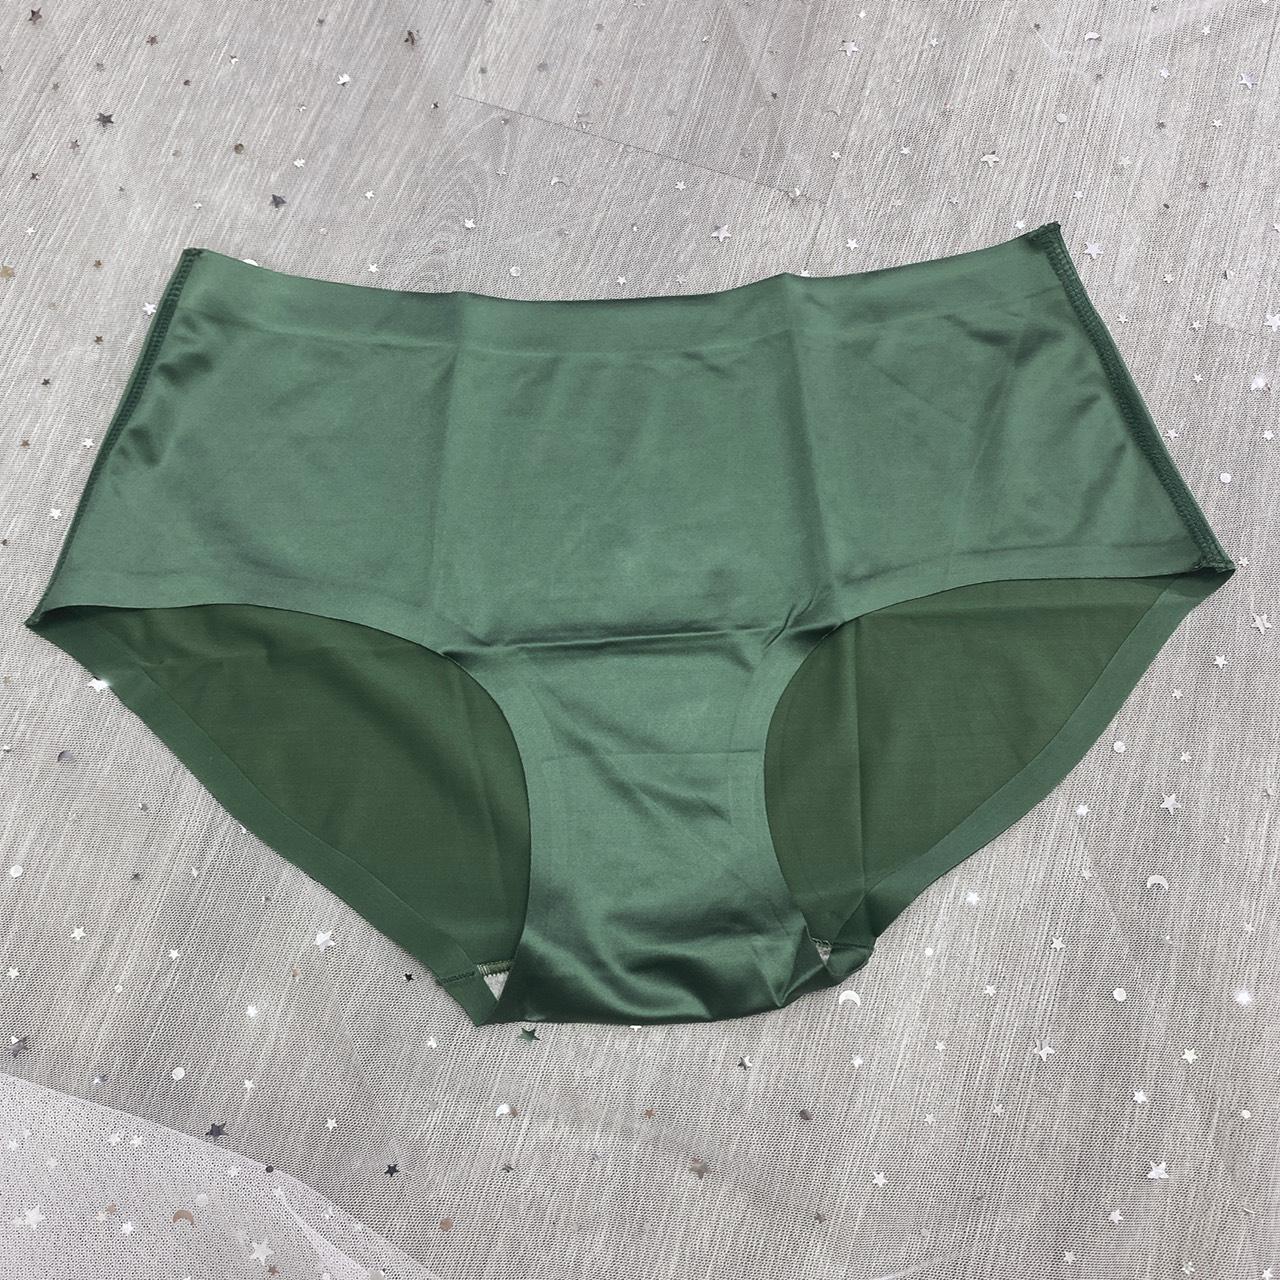 quần lót size lớn